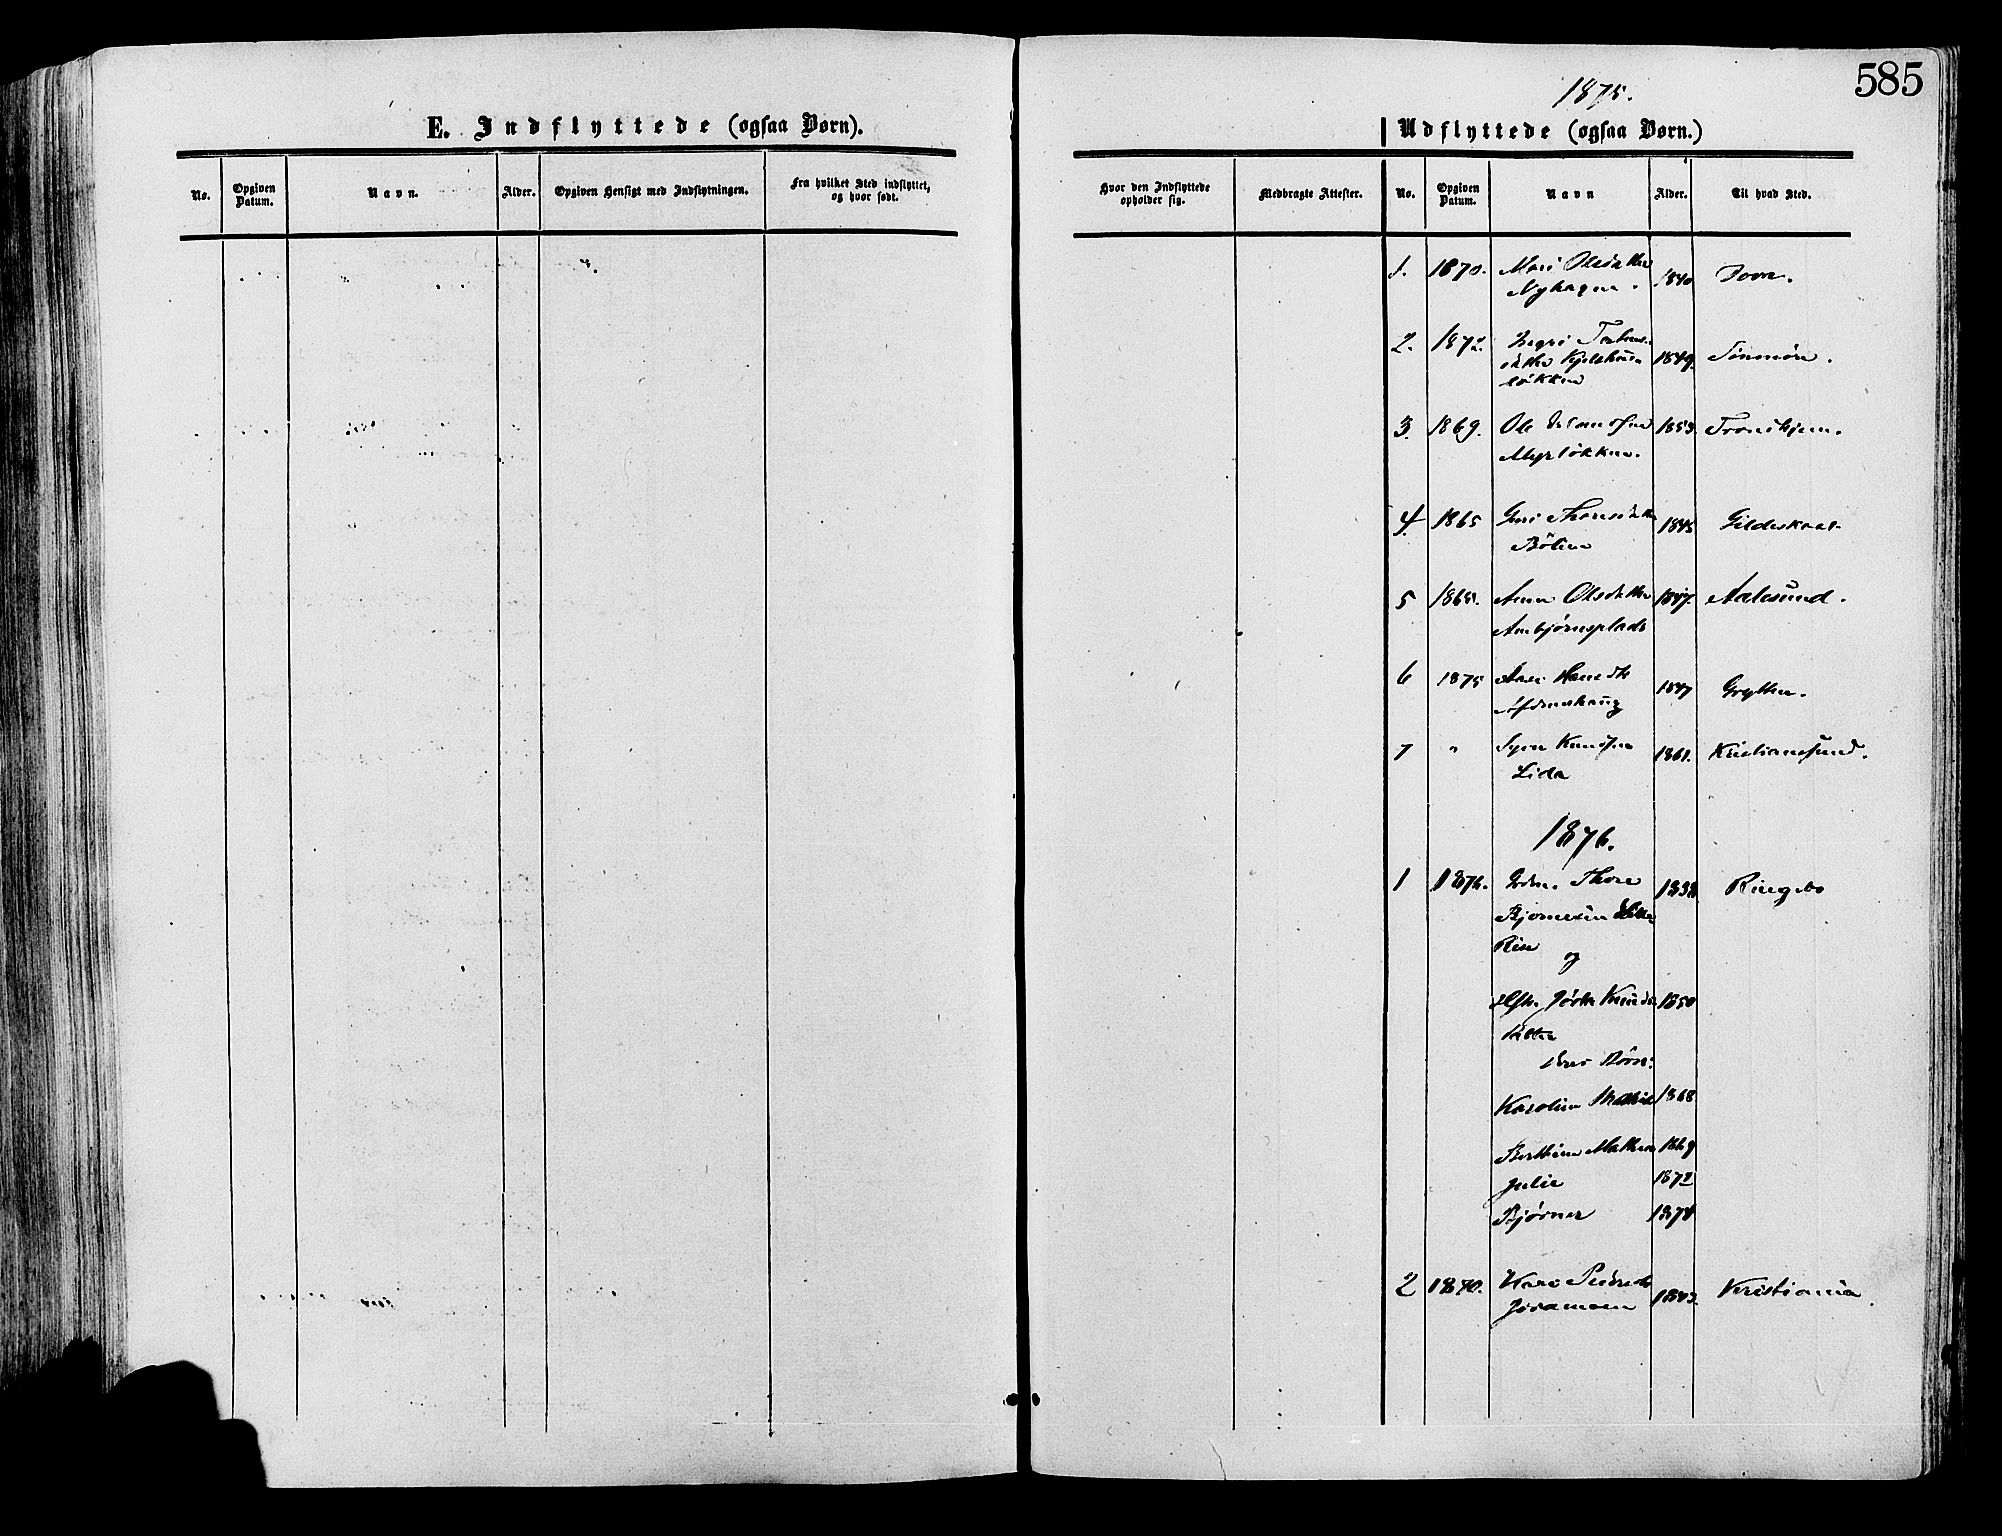 SAH, Lesja prestekontor, Ministerialbok nr. 8, 1854-1880, s. 585